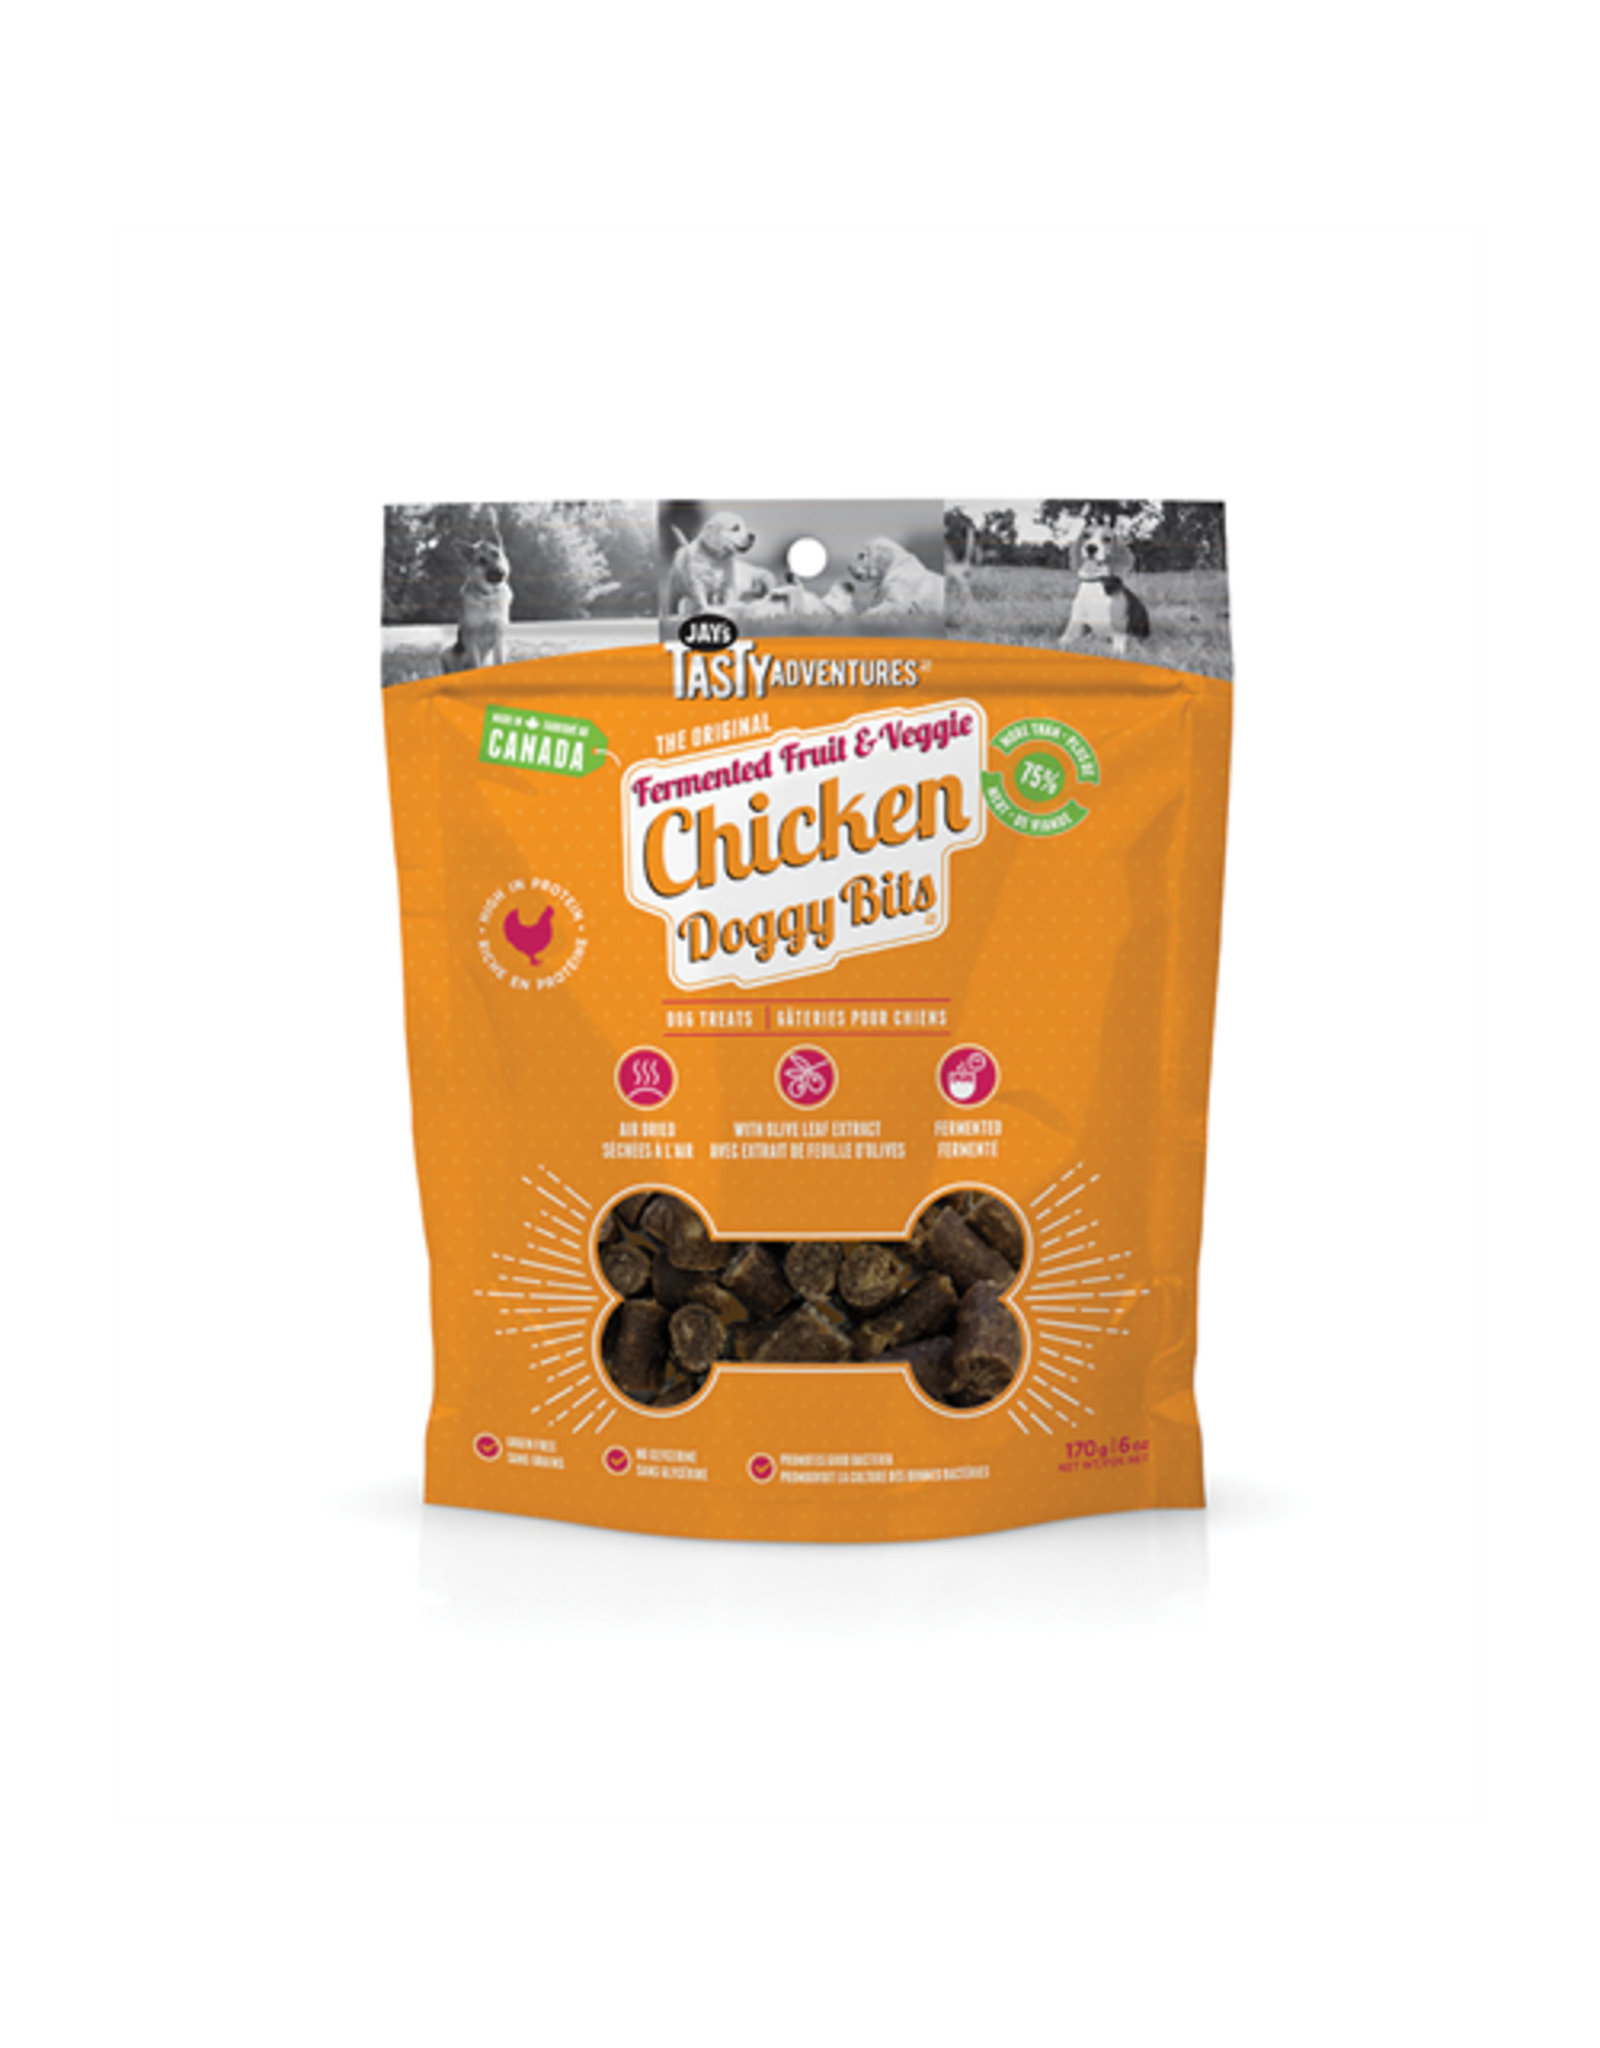 Jay's Tasty Adventures Jays Fermented Fruit & Veggie Chicken Dog Treats 170g